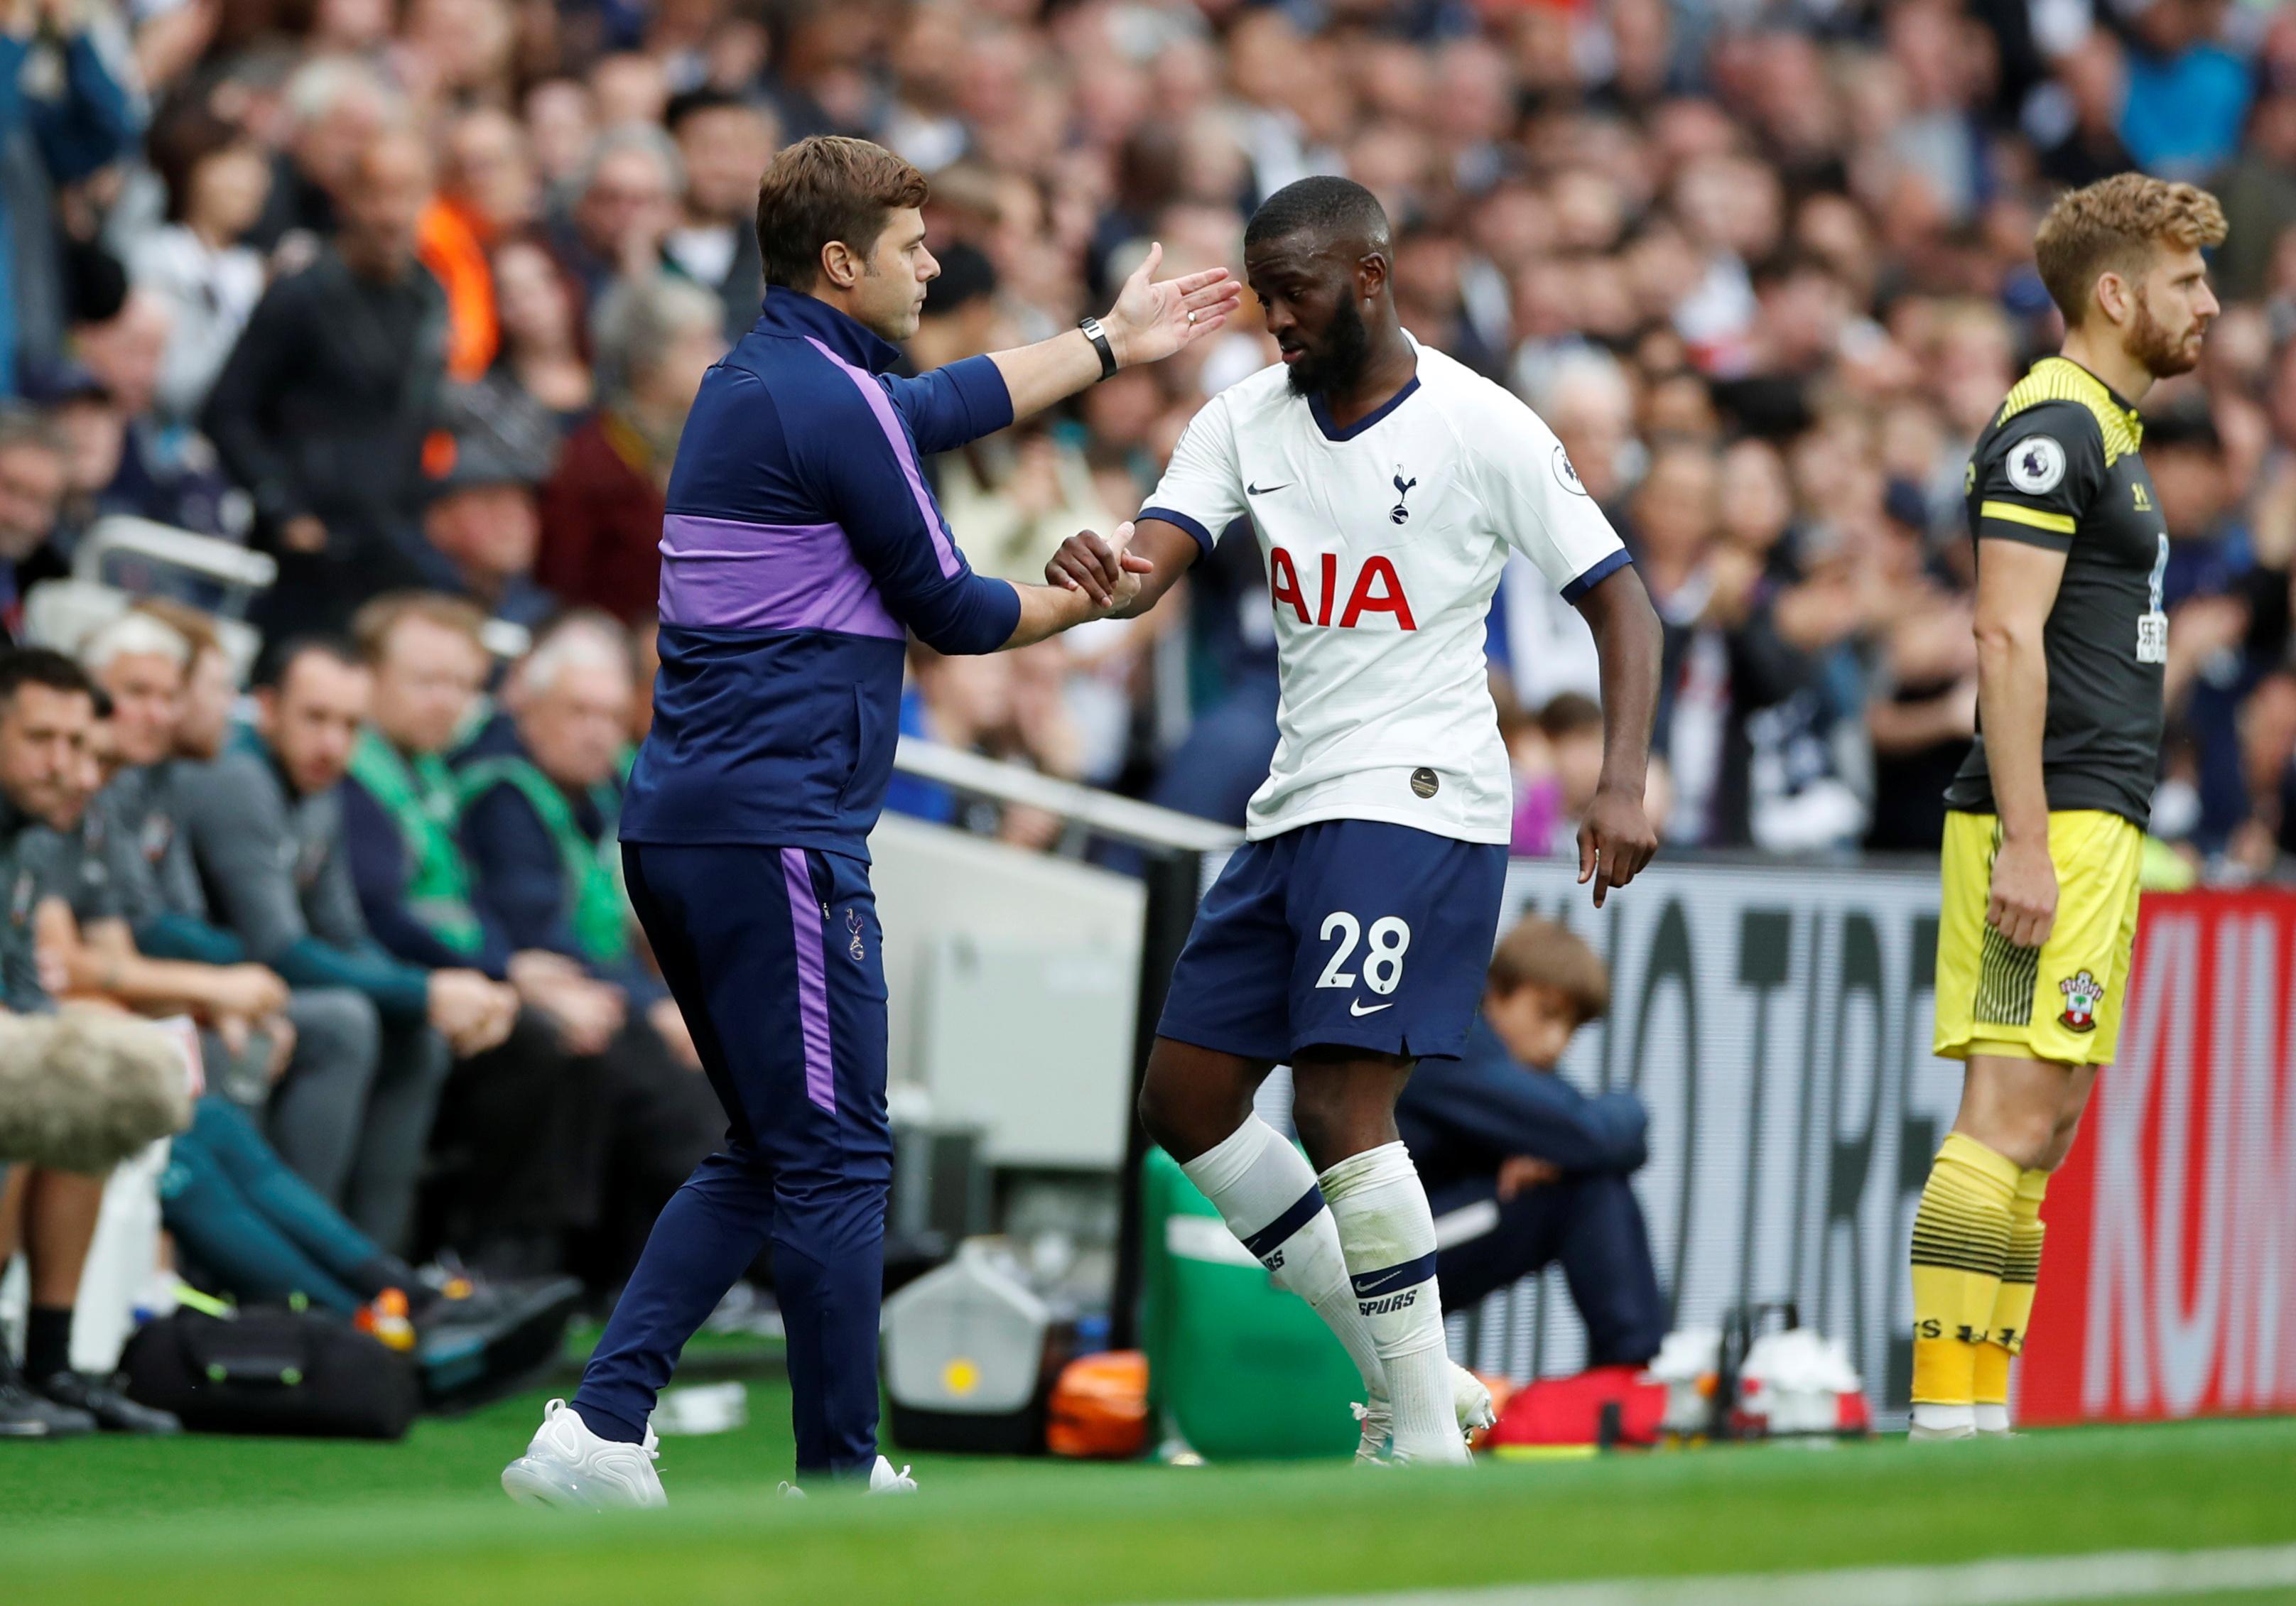 Football - Etranger - Liverpool-Tottenham : en 5 mois, tout a changé pour Pochettino